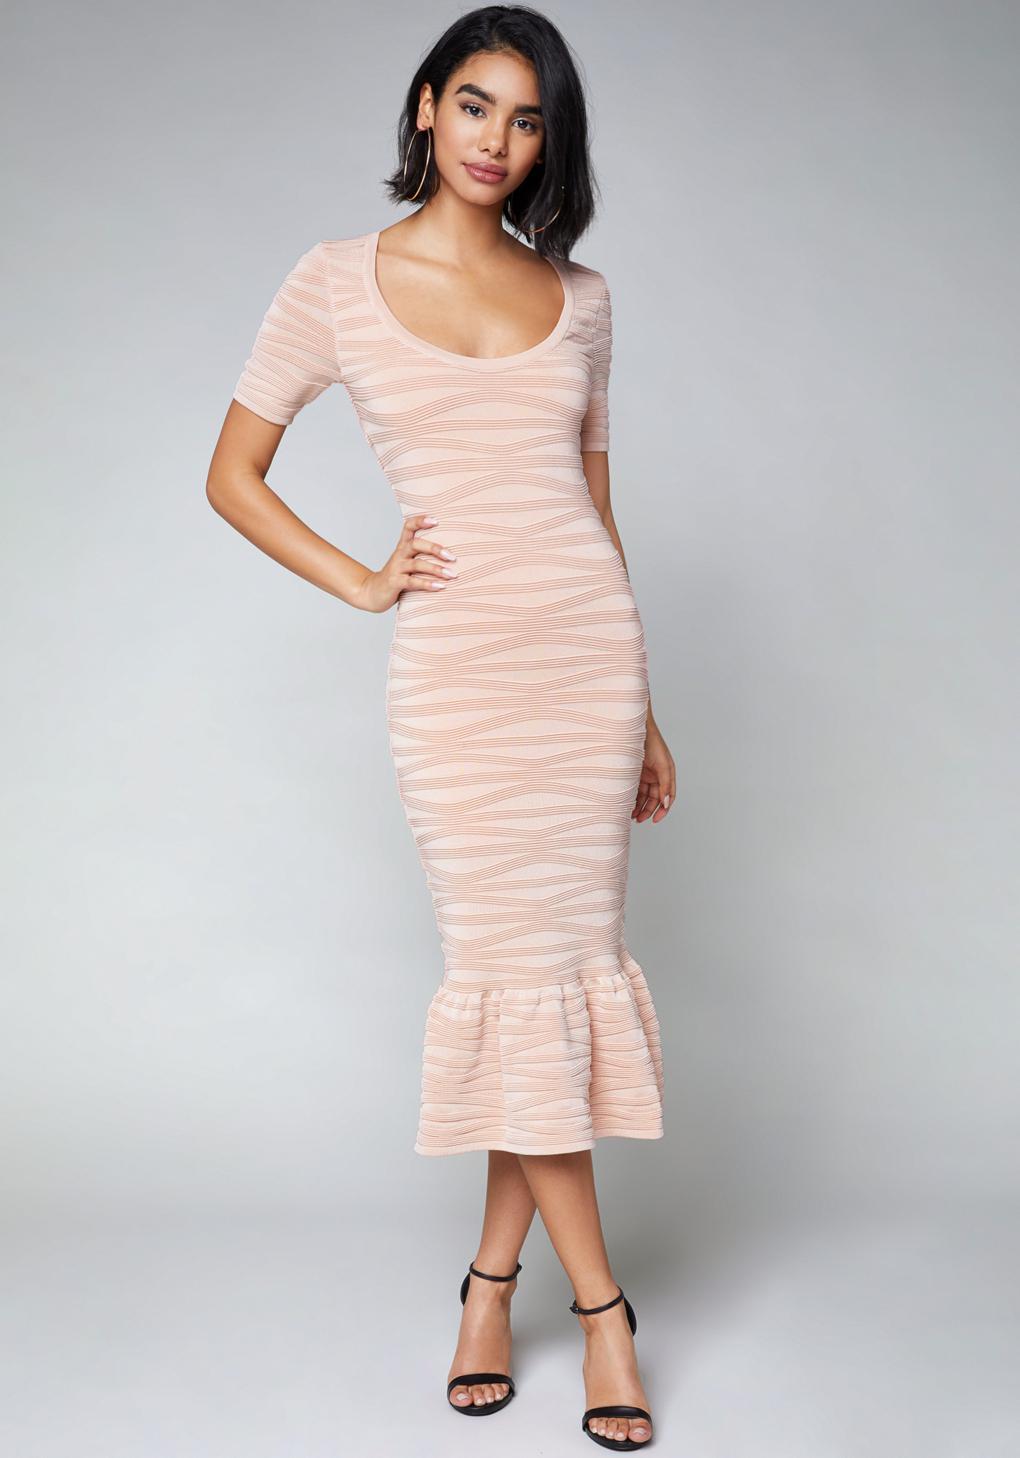 lyst bebe whitney midi dress in pink. Black Bedroom Furniture Sets. Home Design Ideas